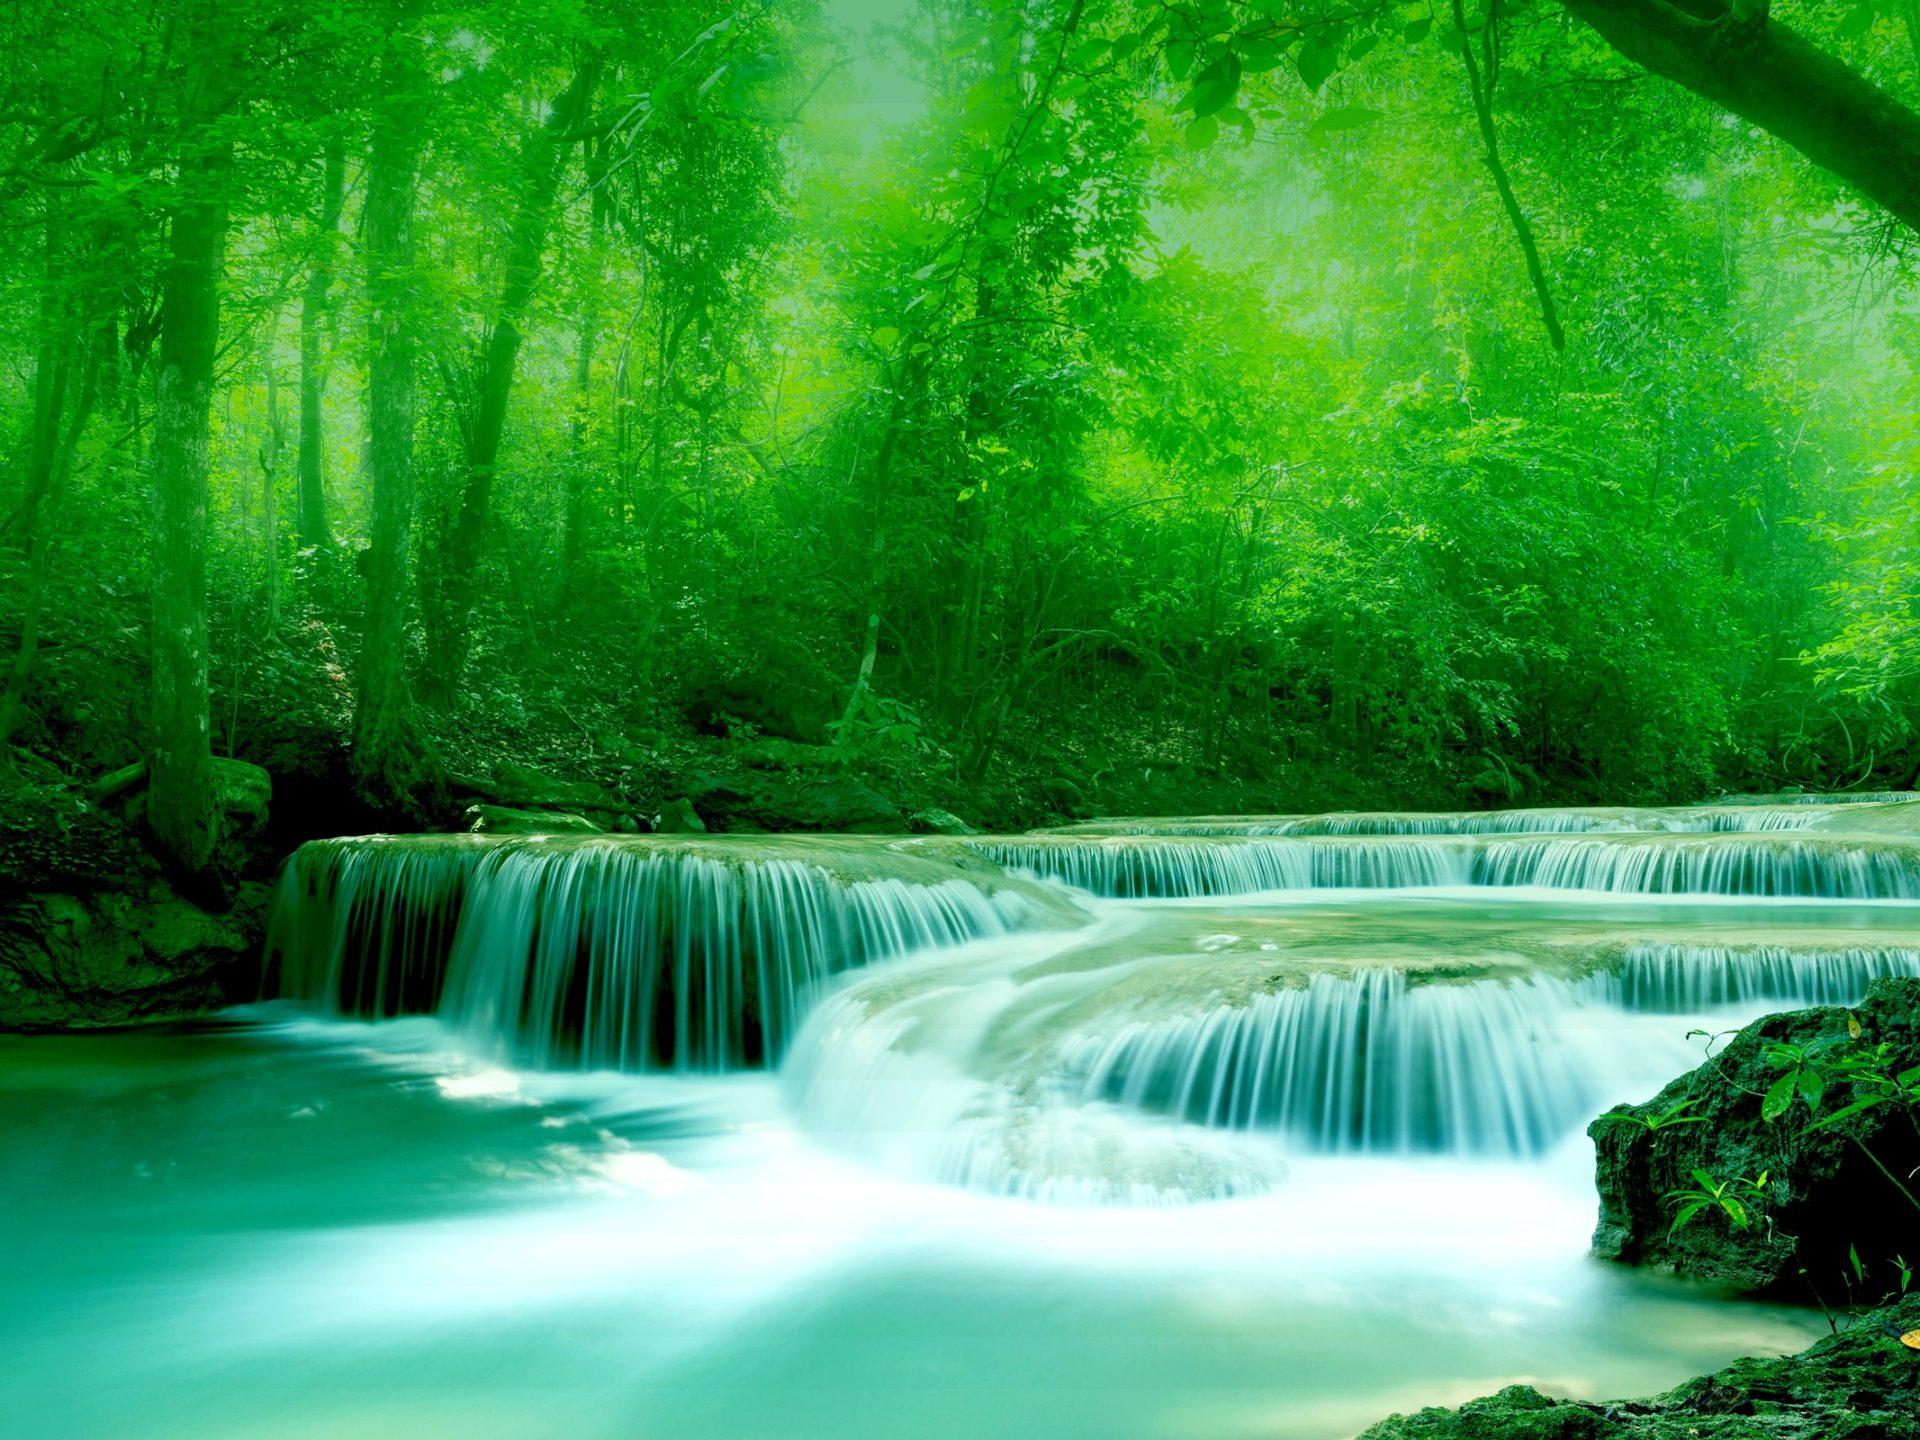 Niagara Falls Waterfall Wallpaper Wallpaper River Water Rocks Trees Greenery Free